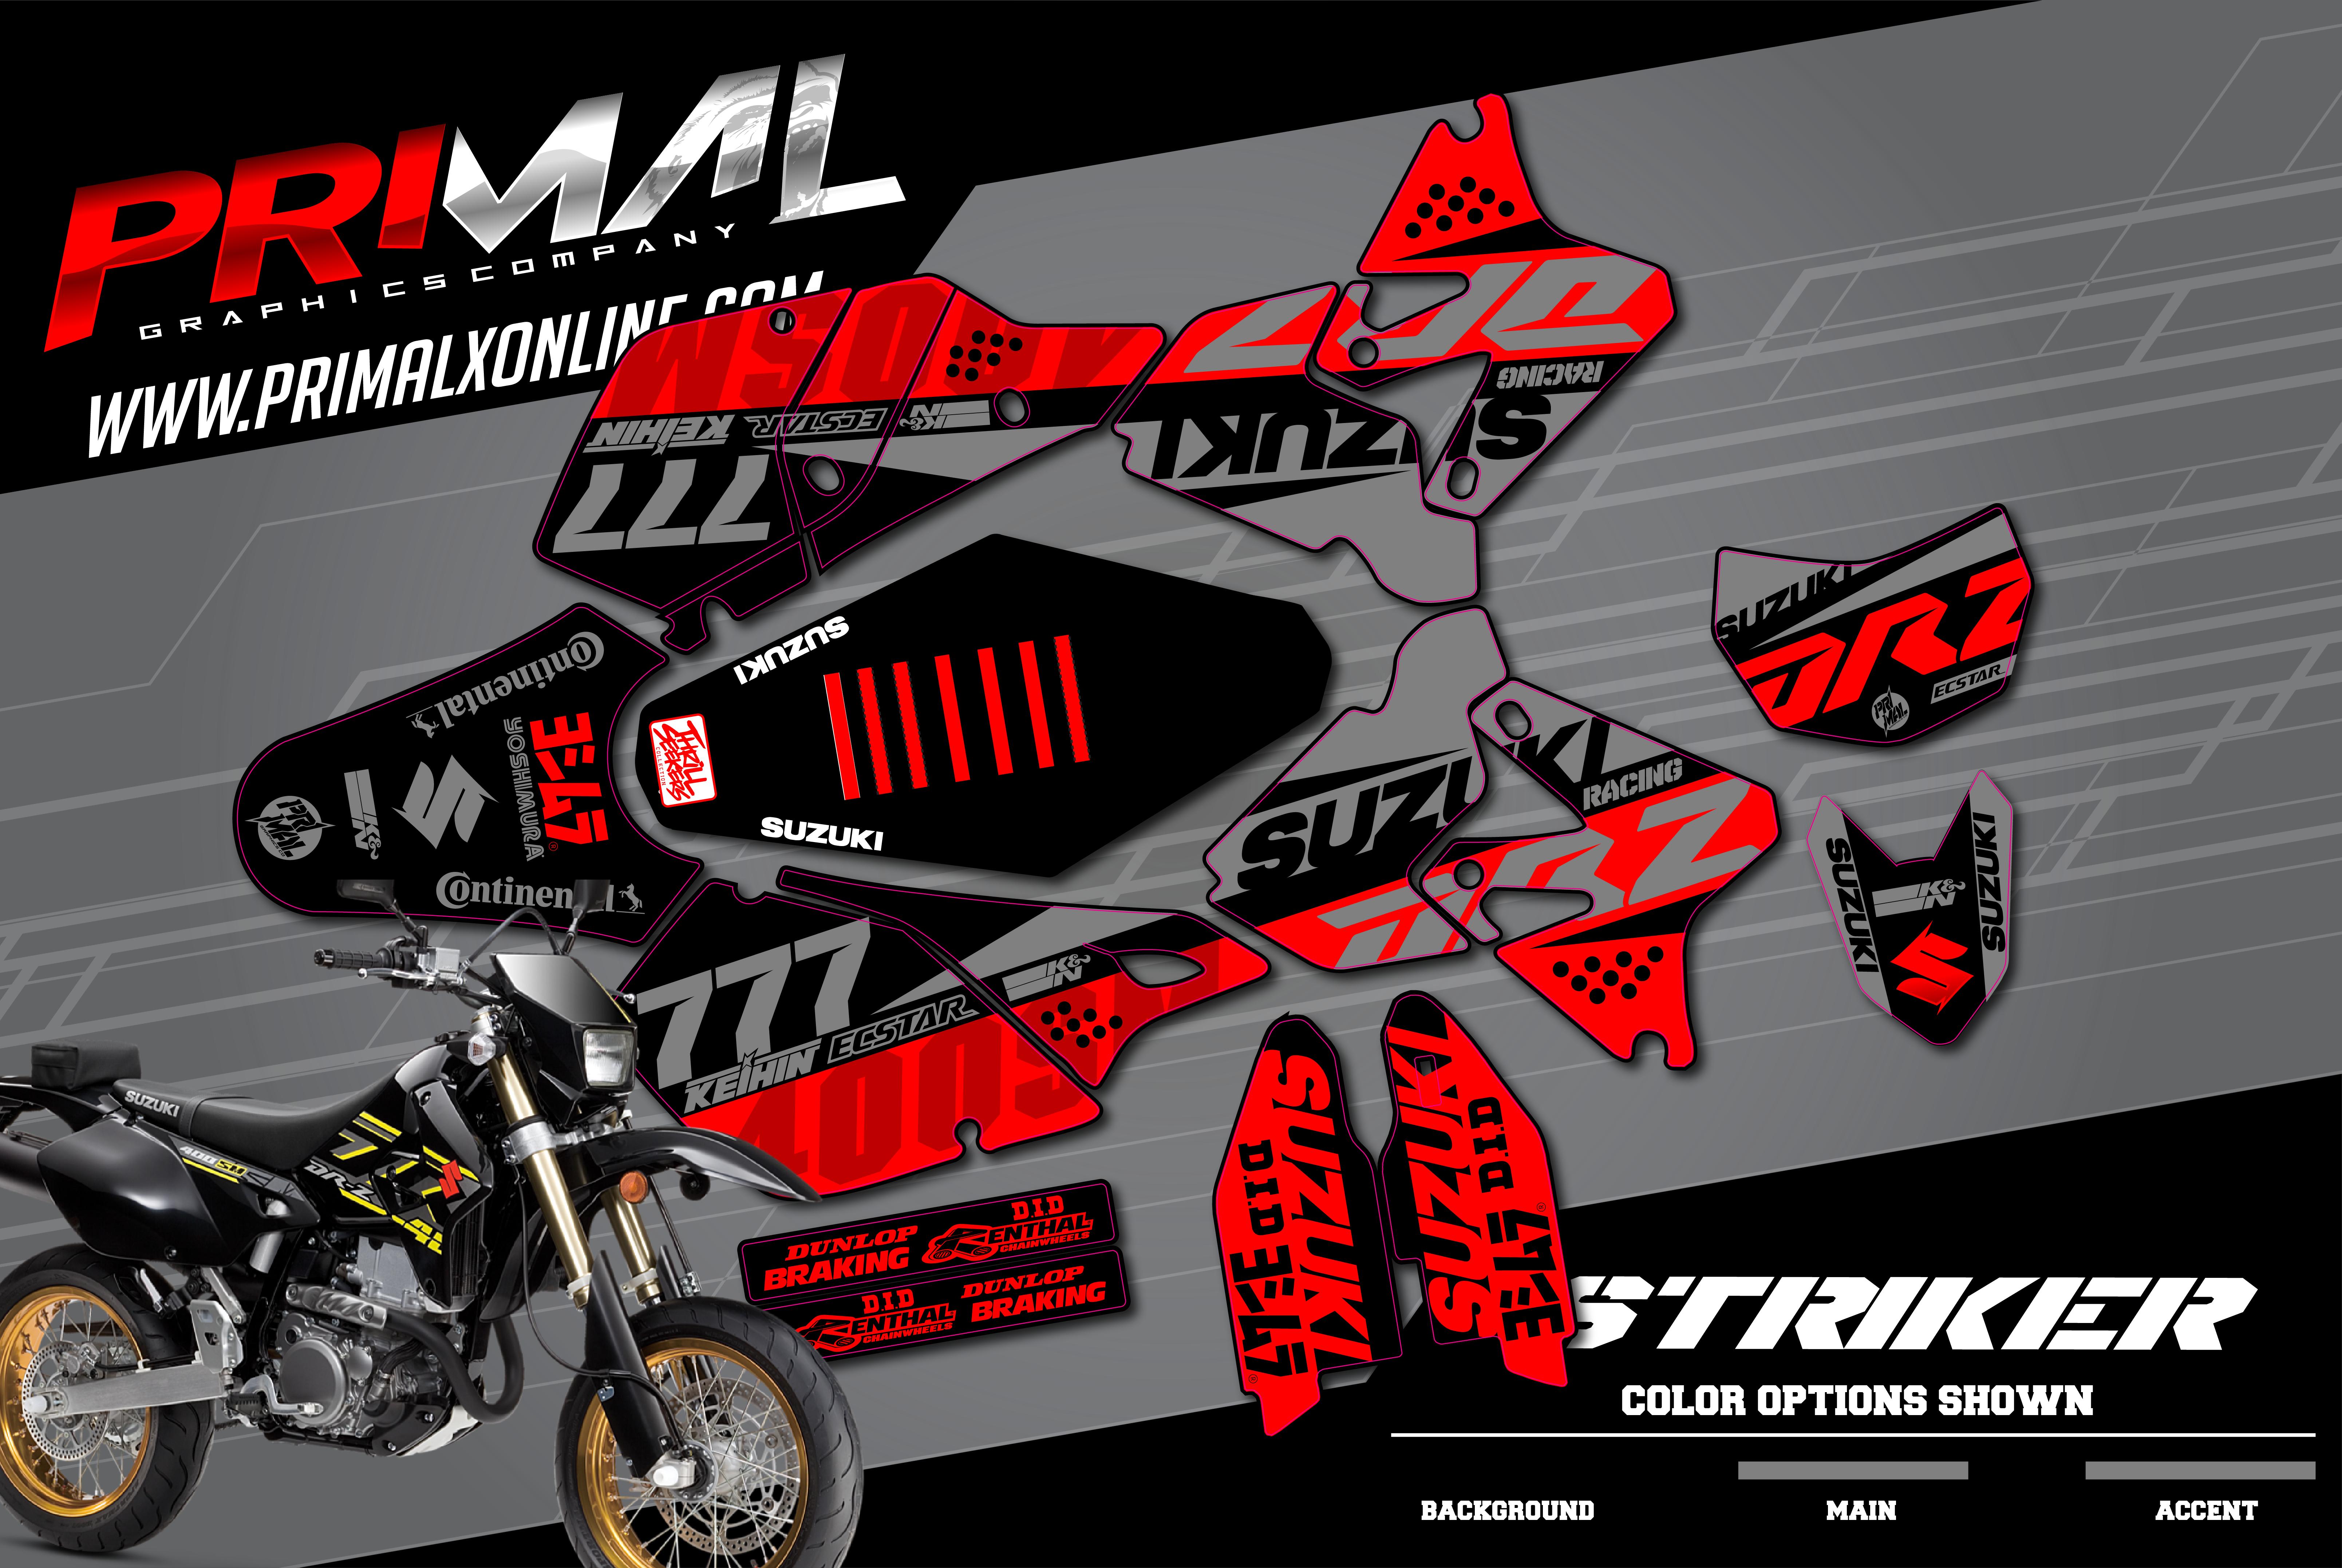 PRIMAL-X-MOTORSPORTS-PRIMAL-GRAPHICS-CO-2021-SUZUKI-DRZ400SM-MOTOCROSS-GRAPHICS-STRIKER-SERIES-SUPERMOTO-01